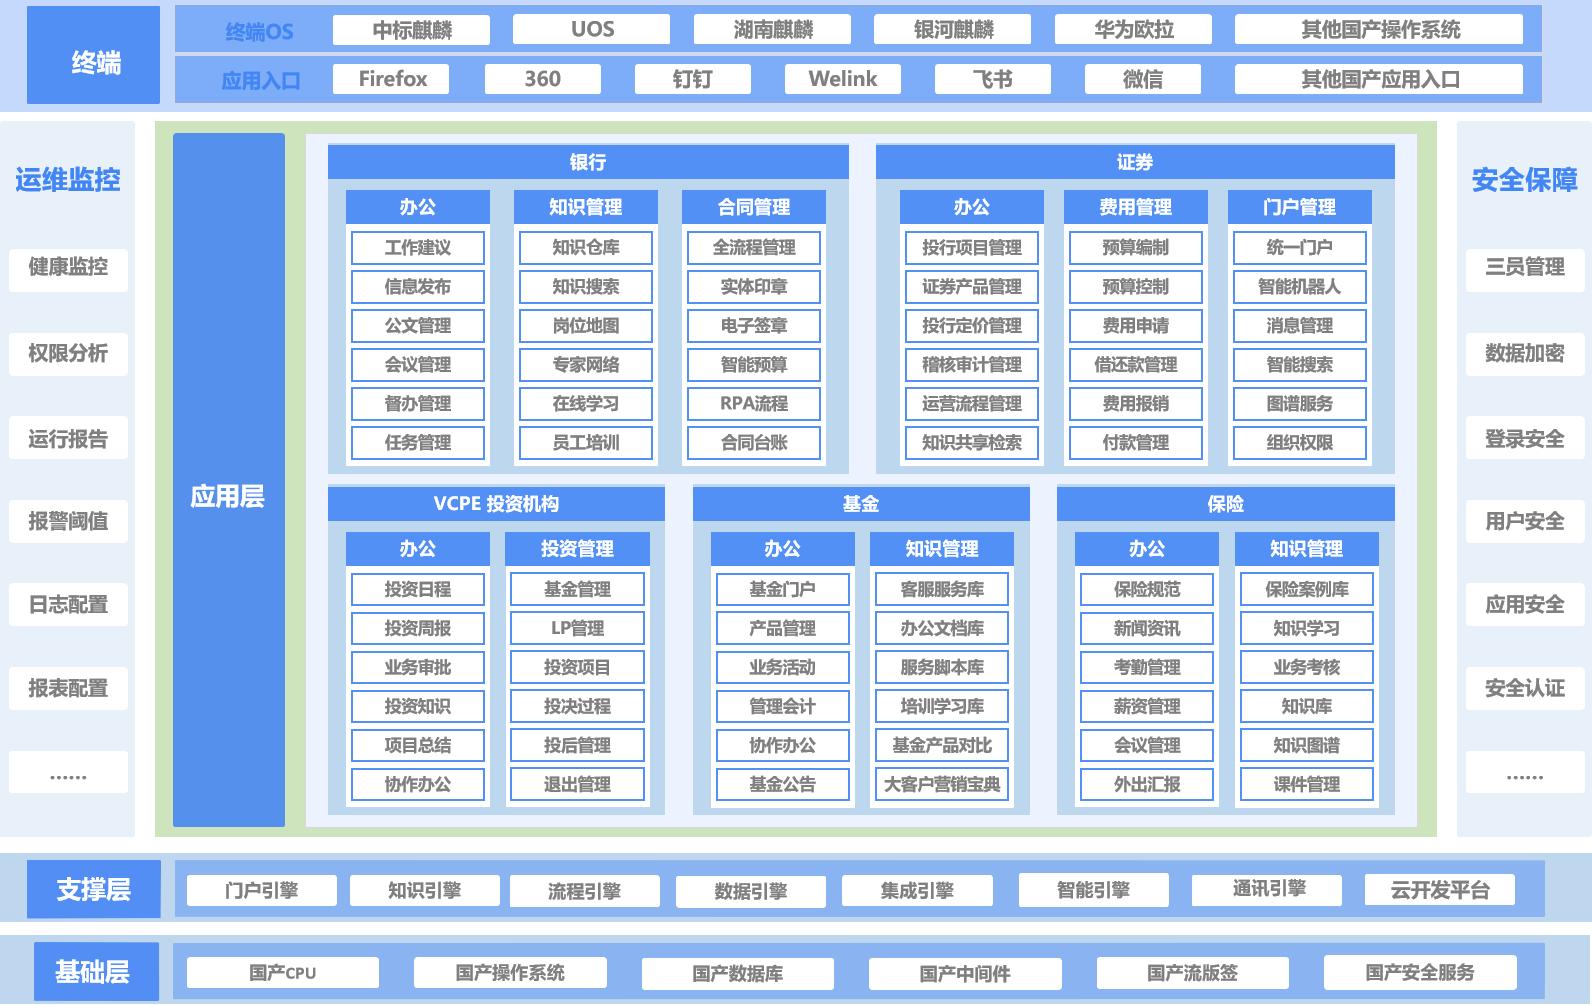 https://www.landray.com.cn/static-old/solution/jinrongxinchuang/images/jgt.png